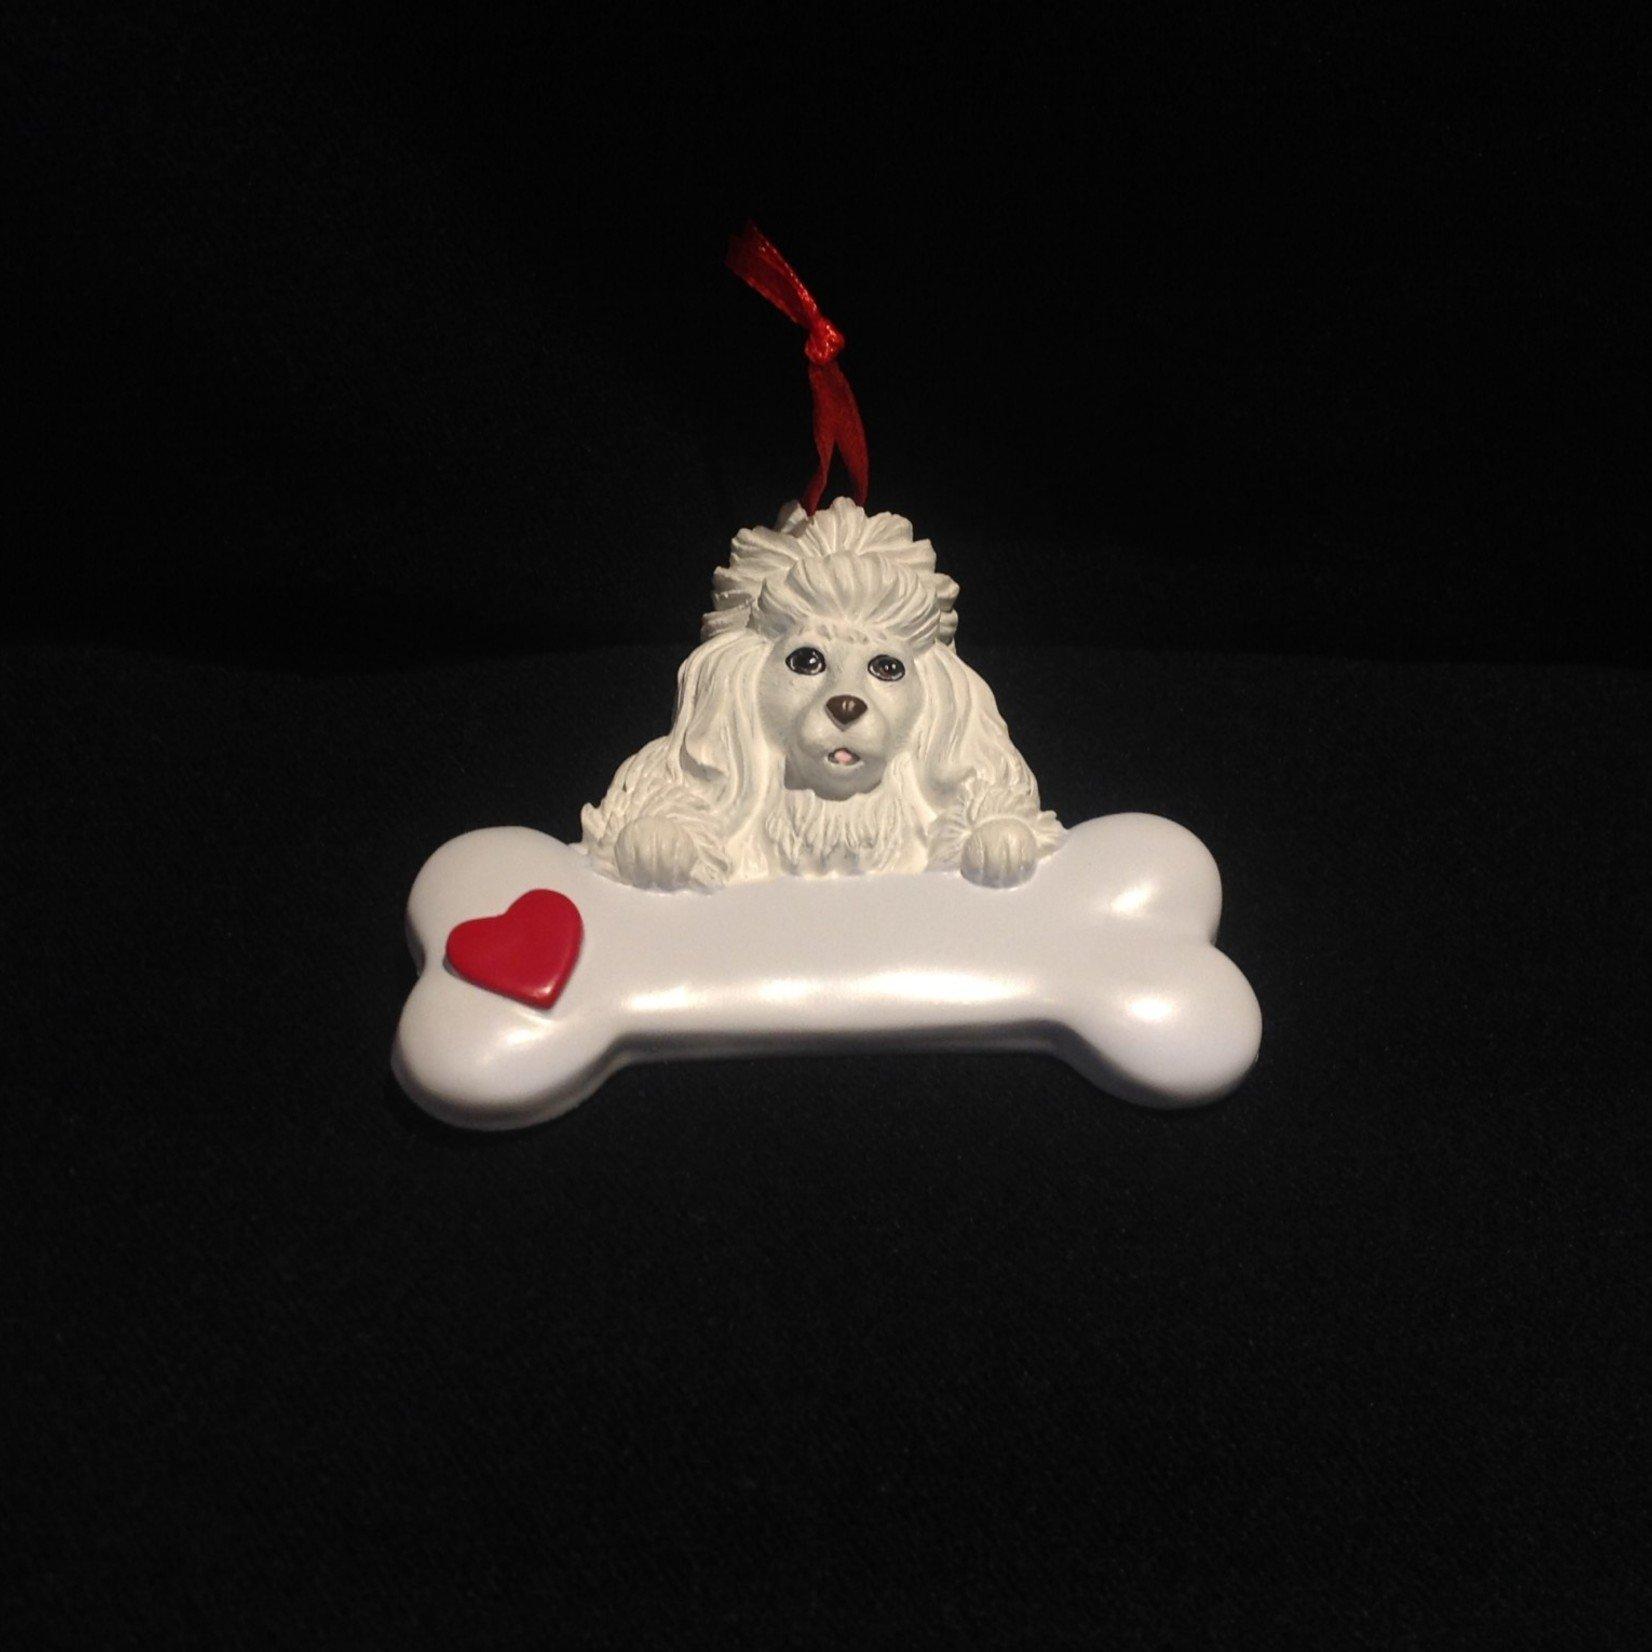 Poodle - White